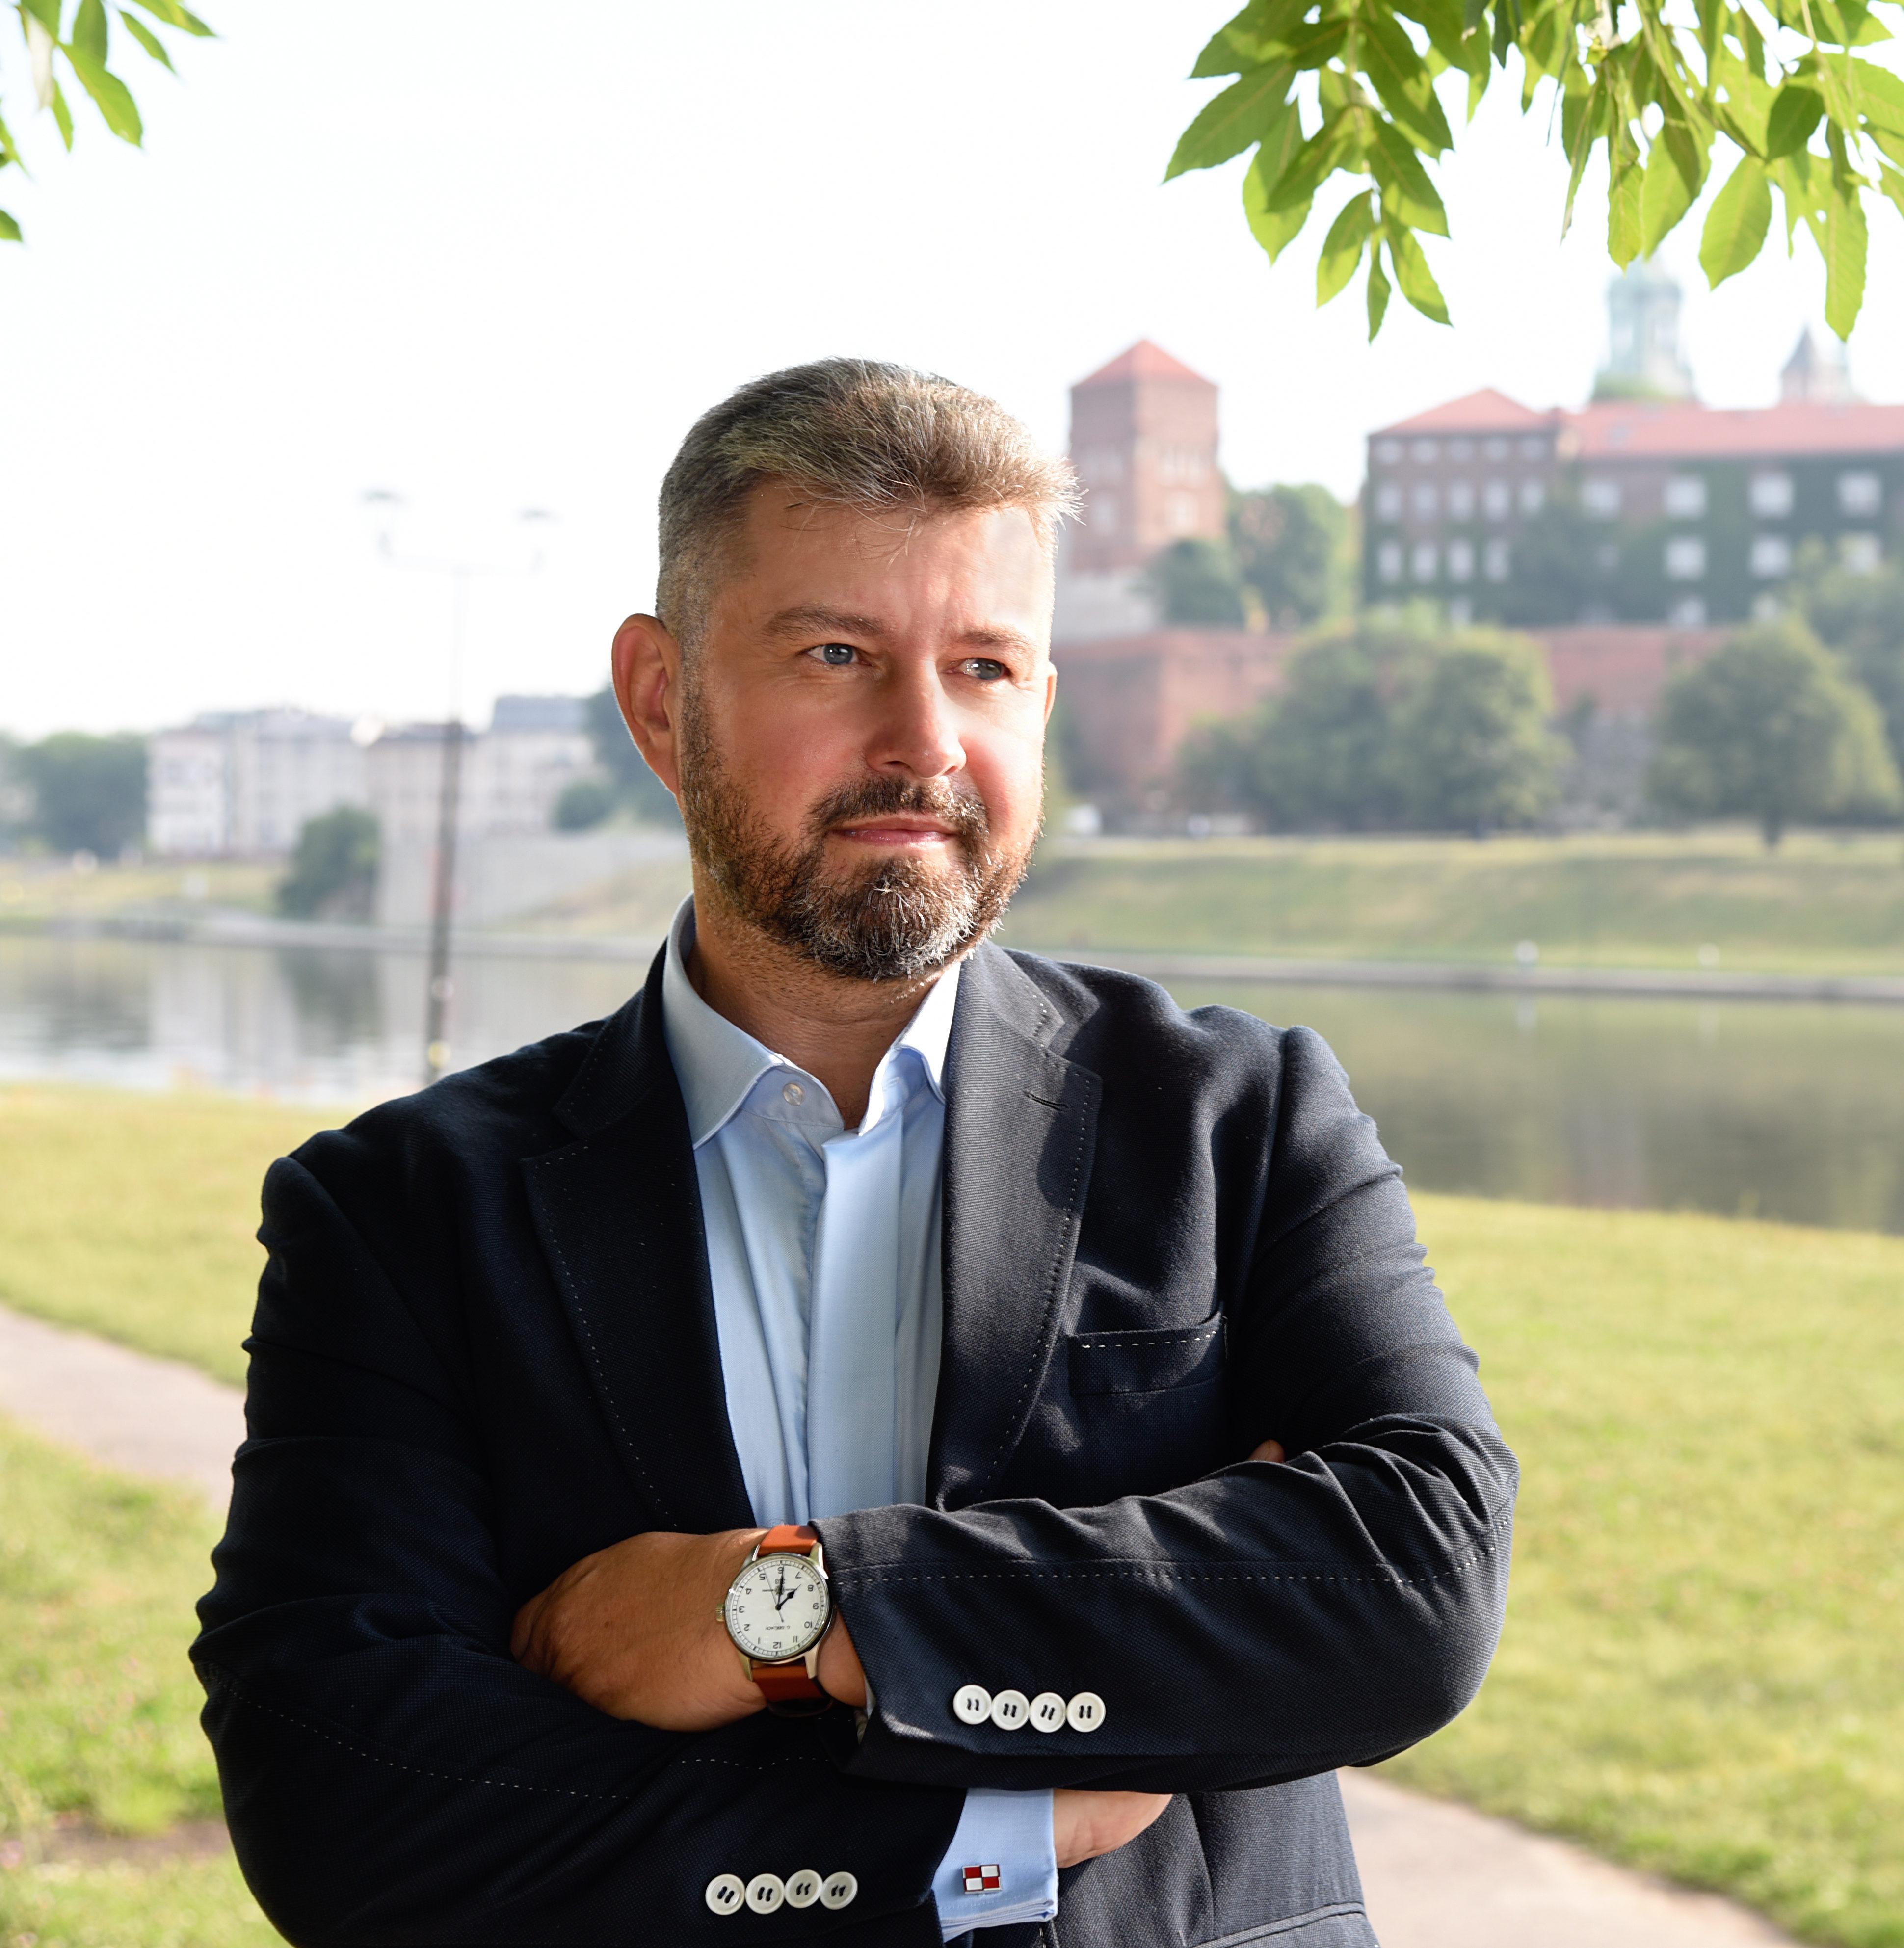 DSC 9232b e1505477959245 - Paweł Matejko